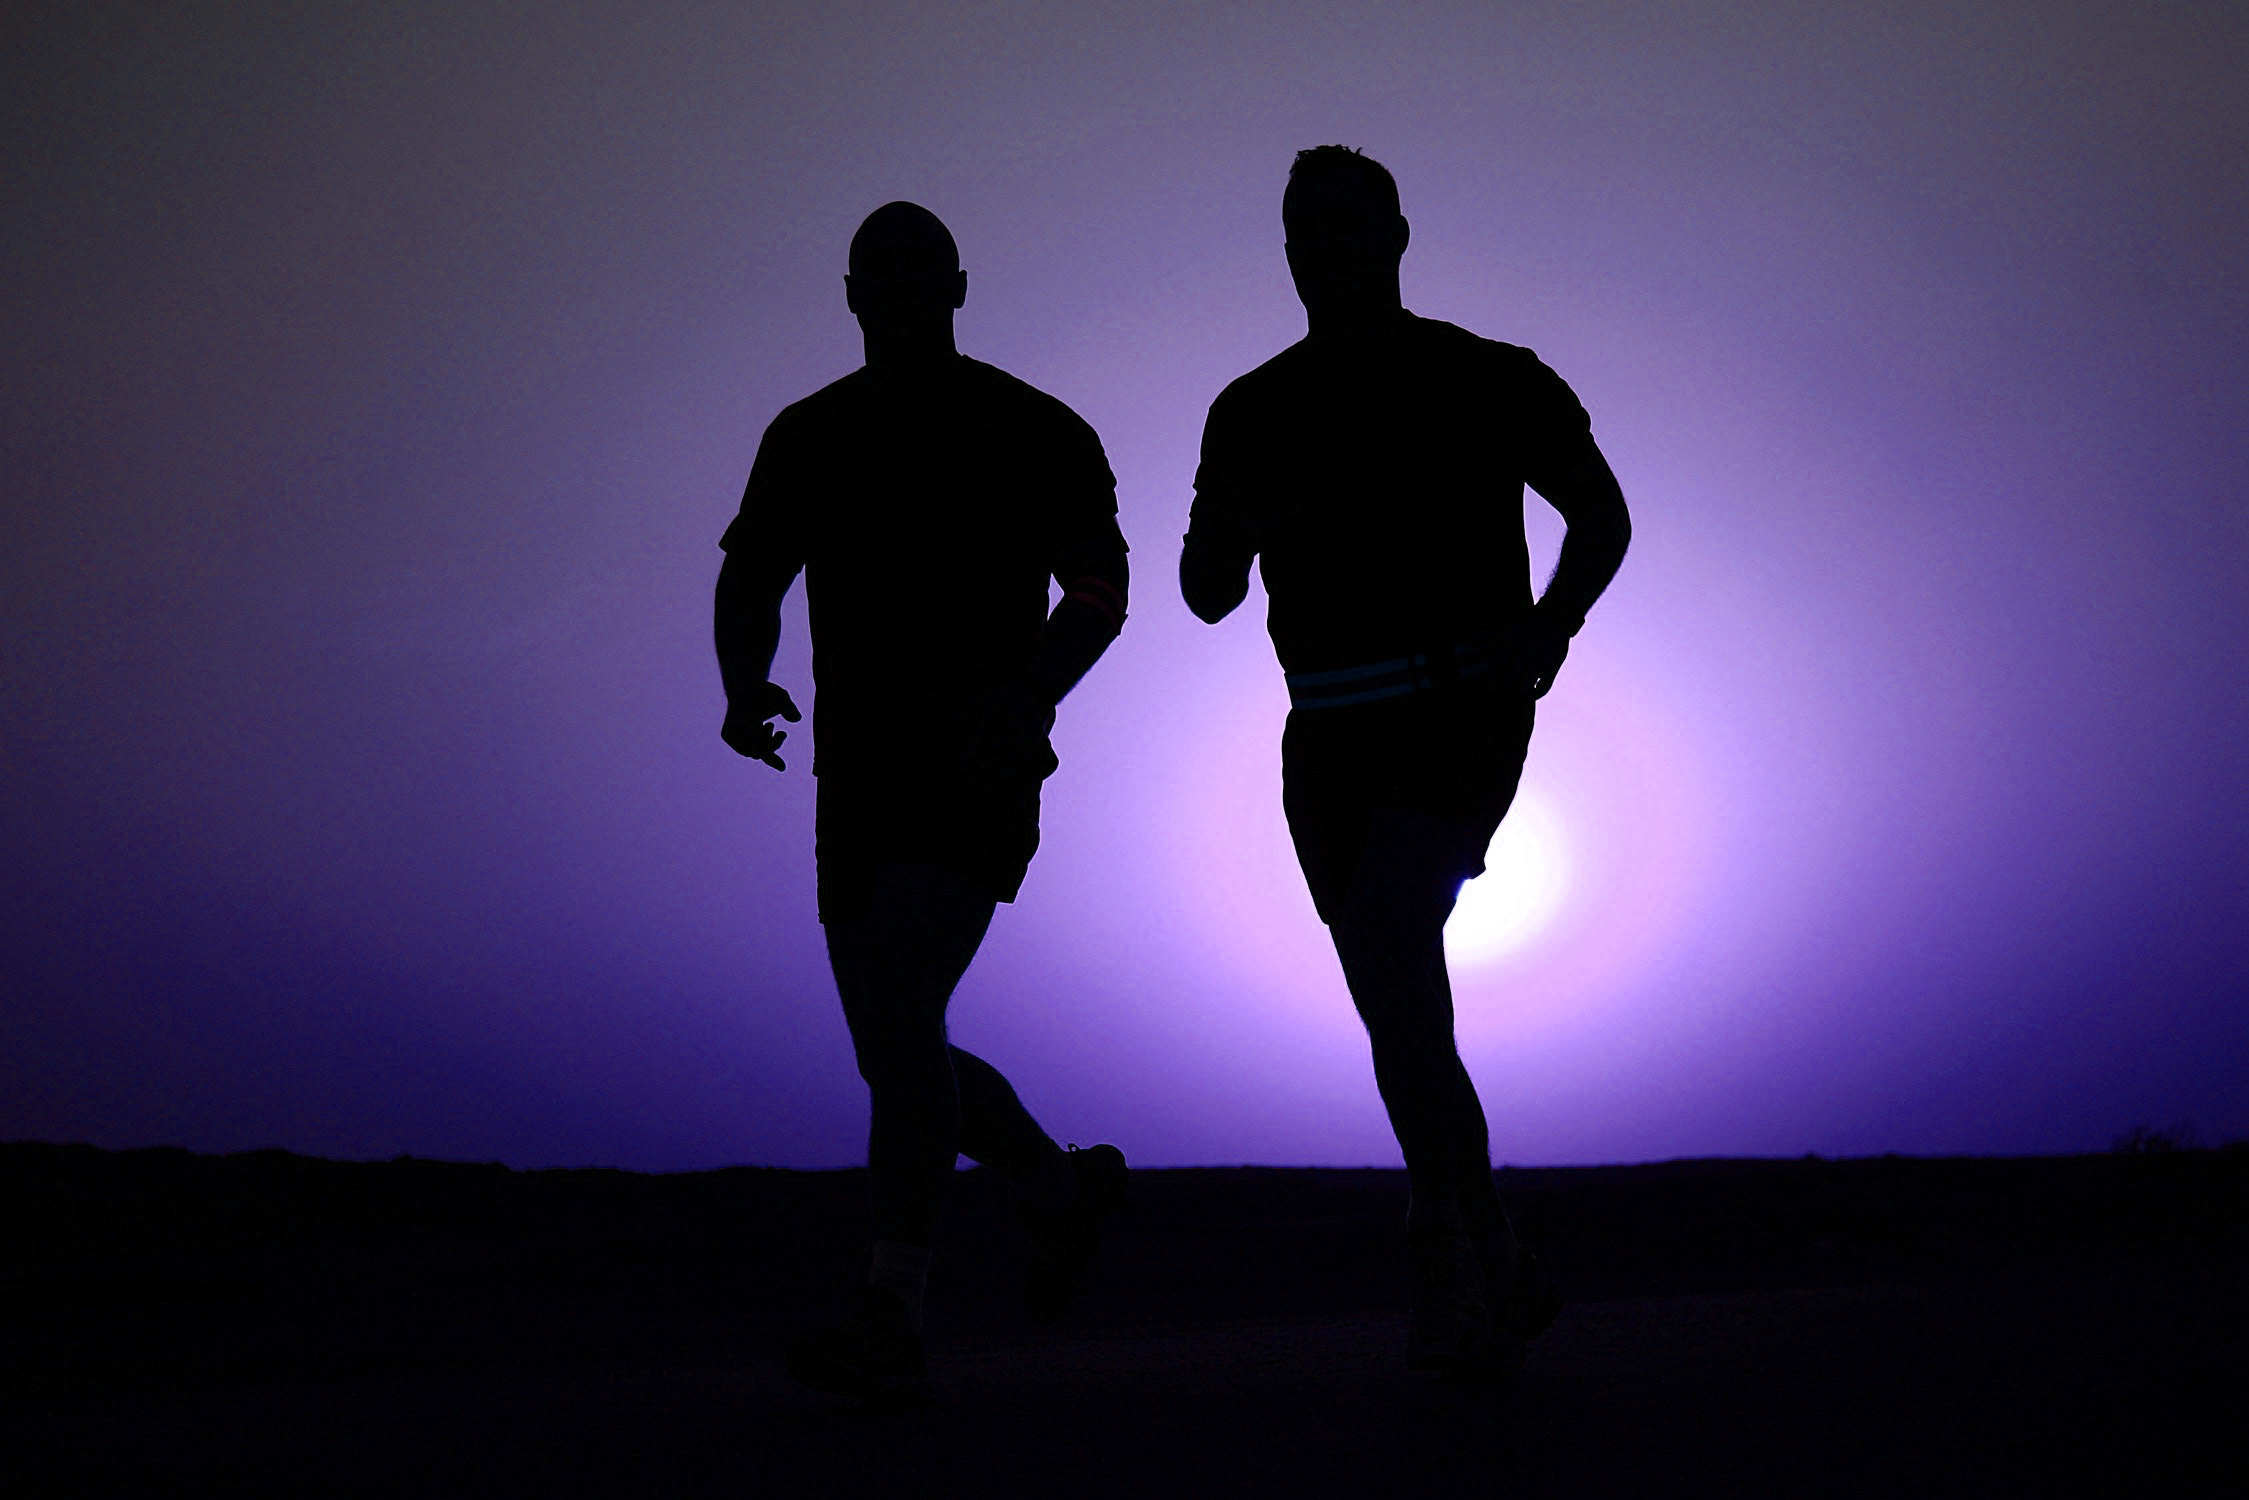 purple dawn-dusk-exercise-39308.jpg